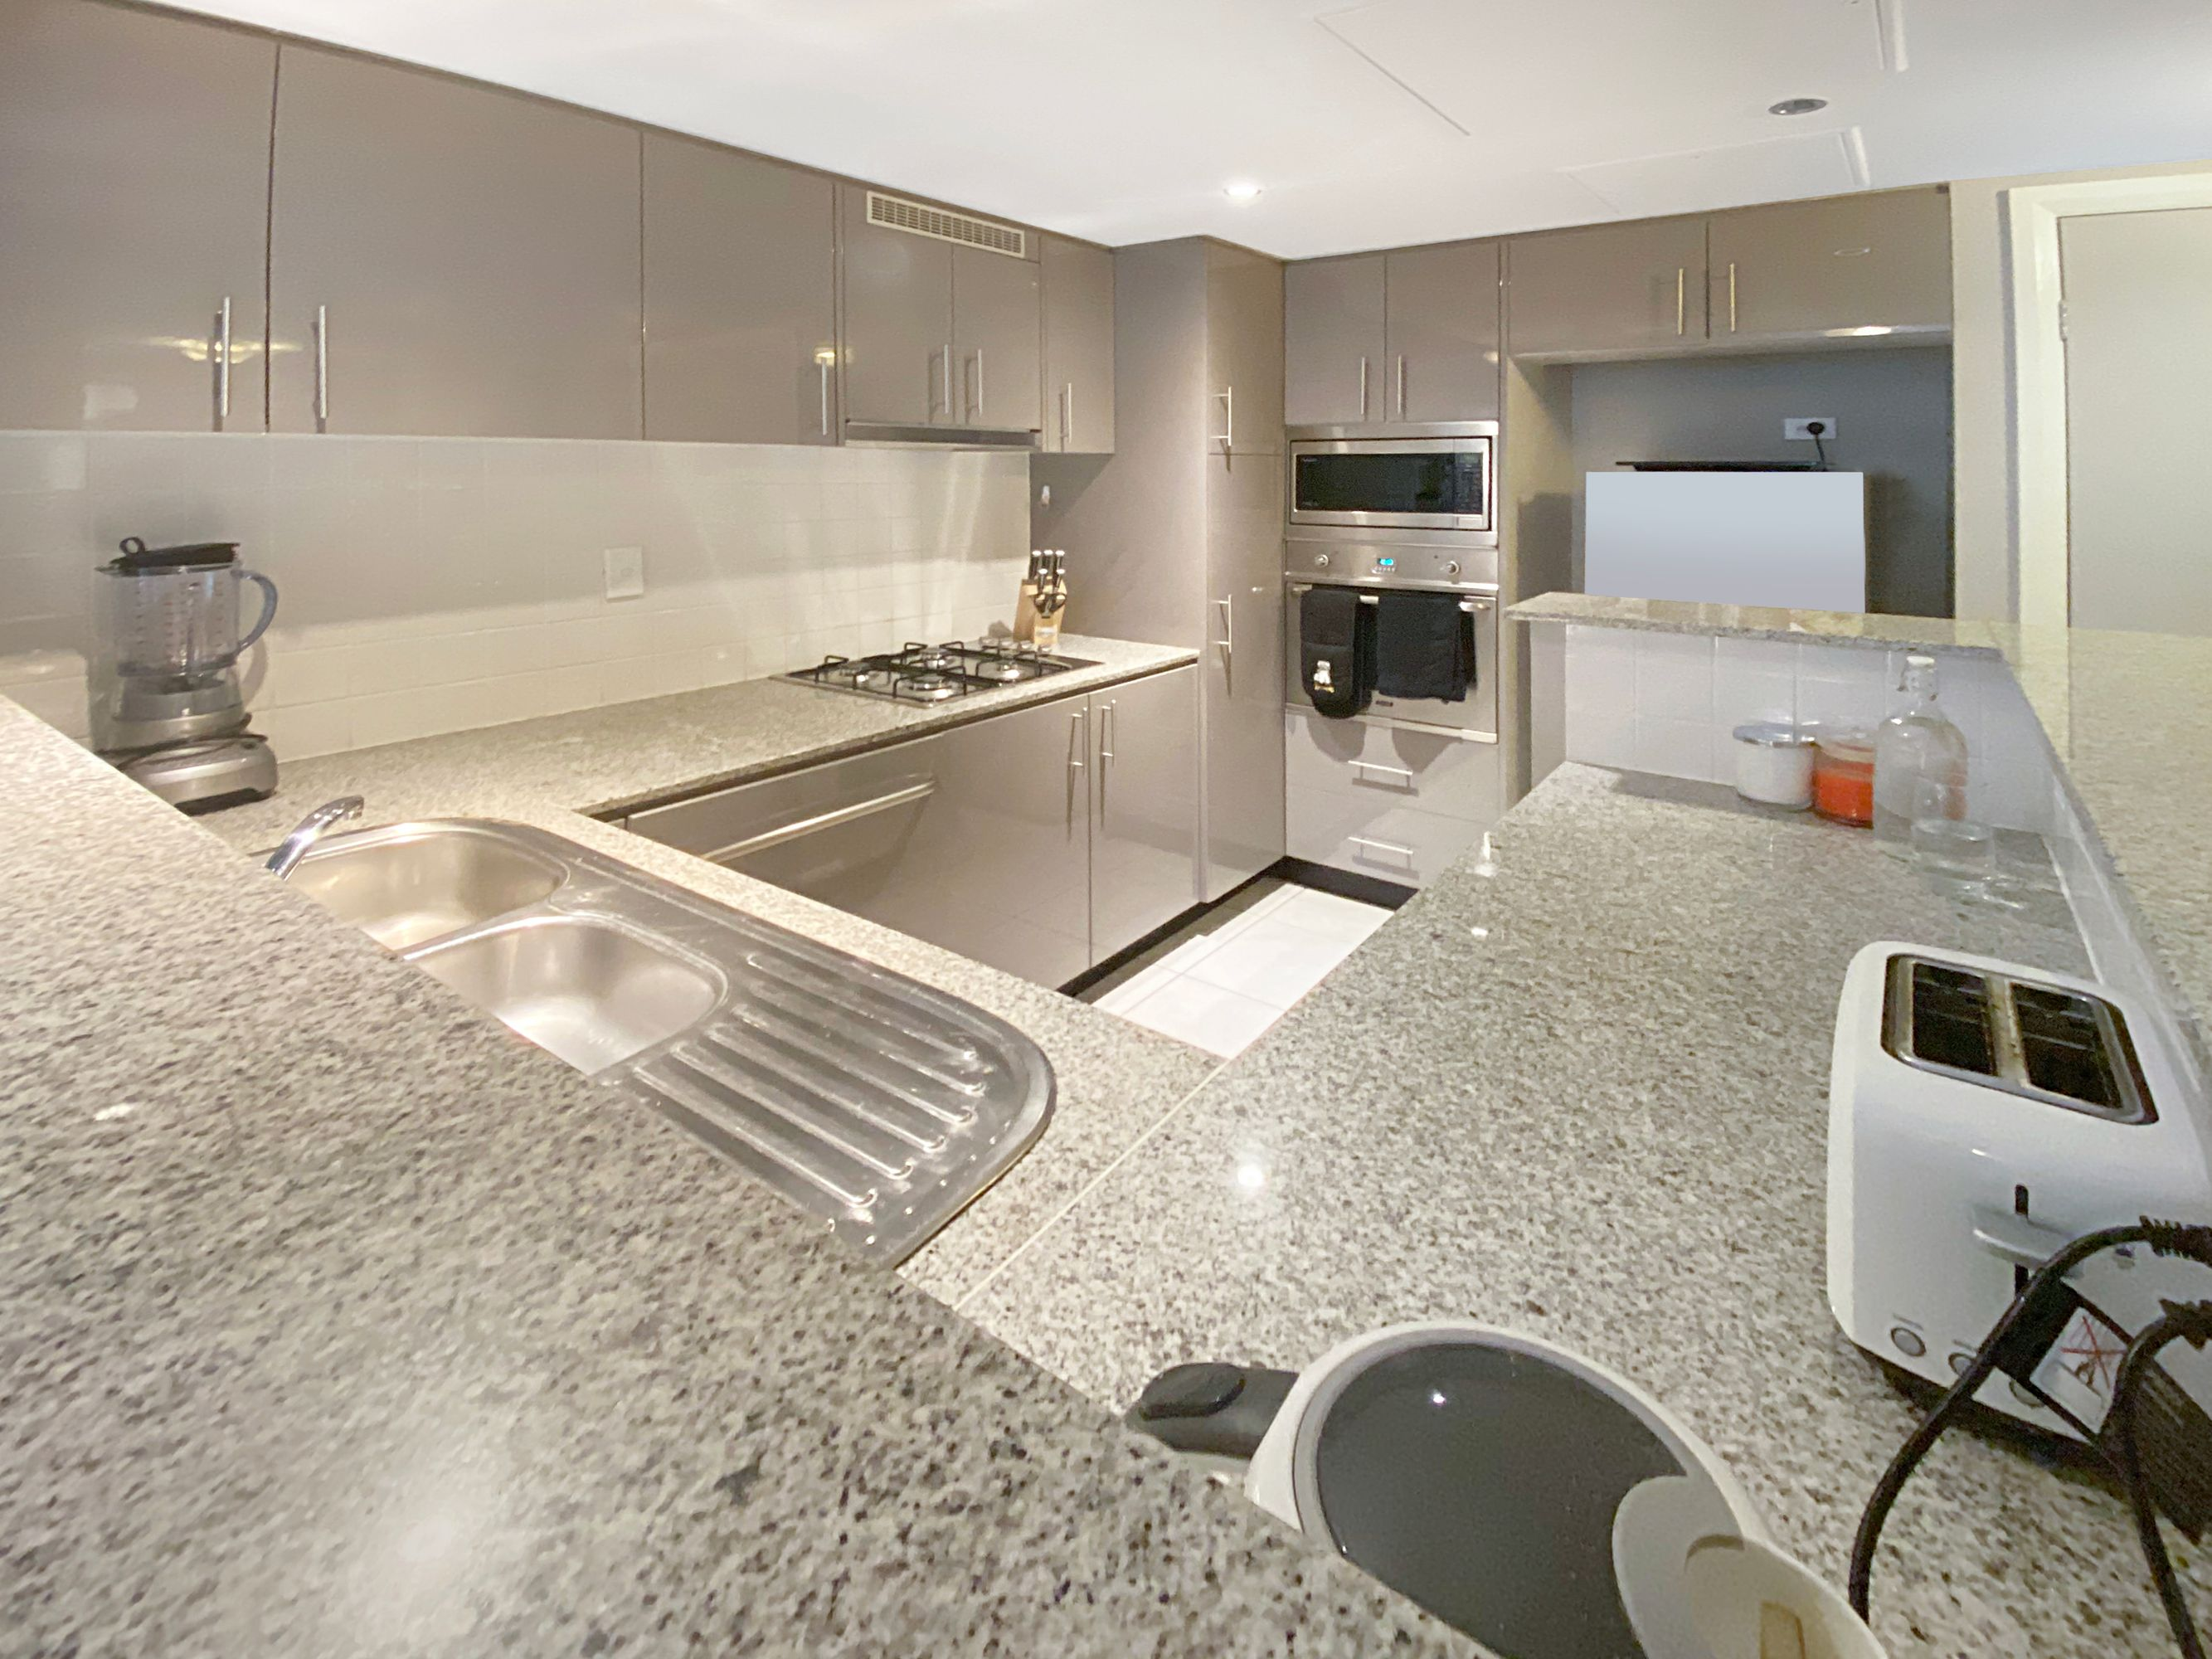 66/141 Bowden Street, Meadowbank, NSW 2114